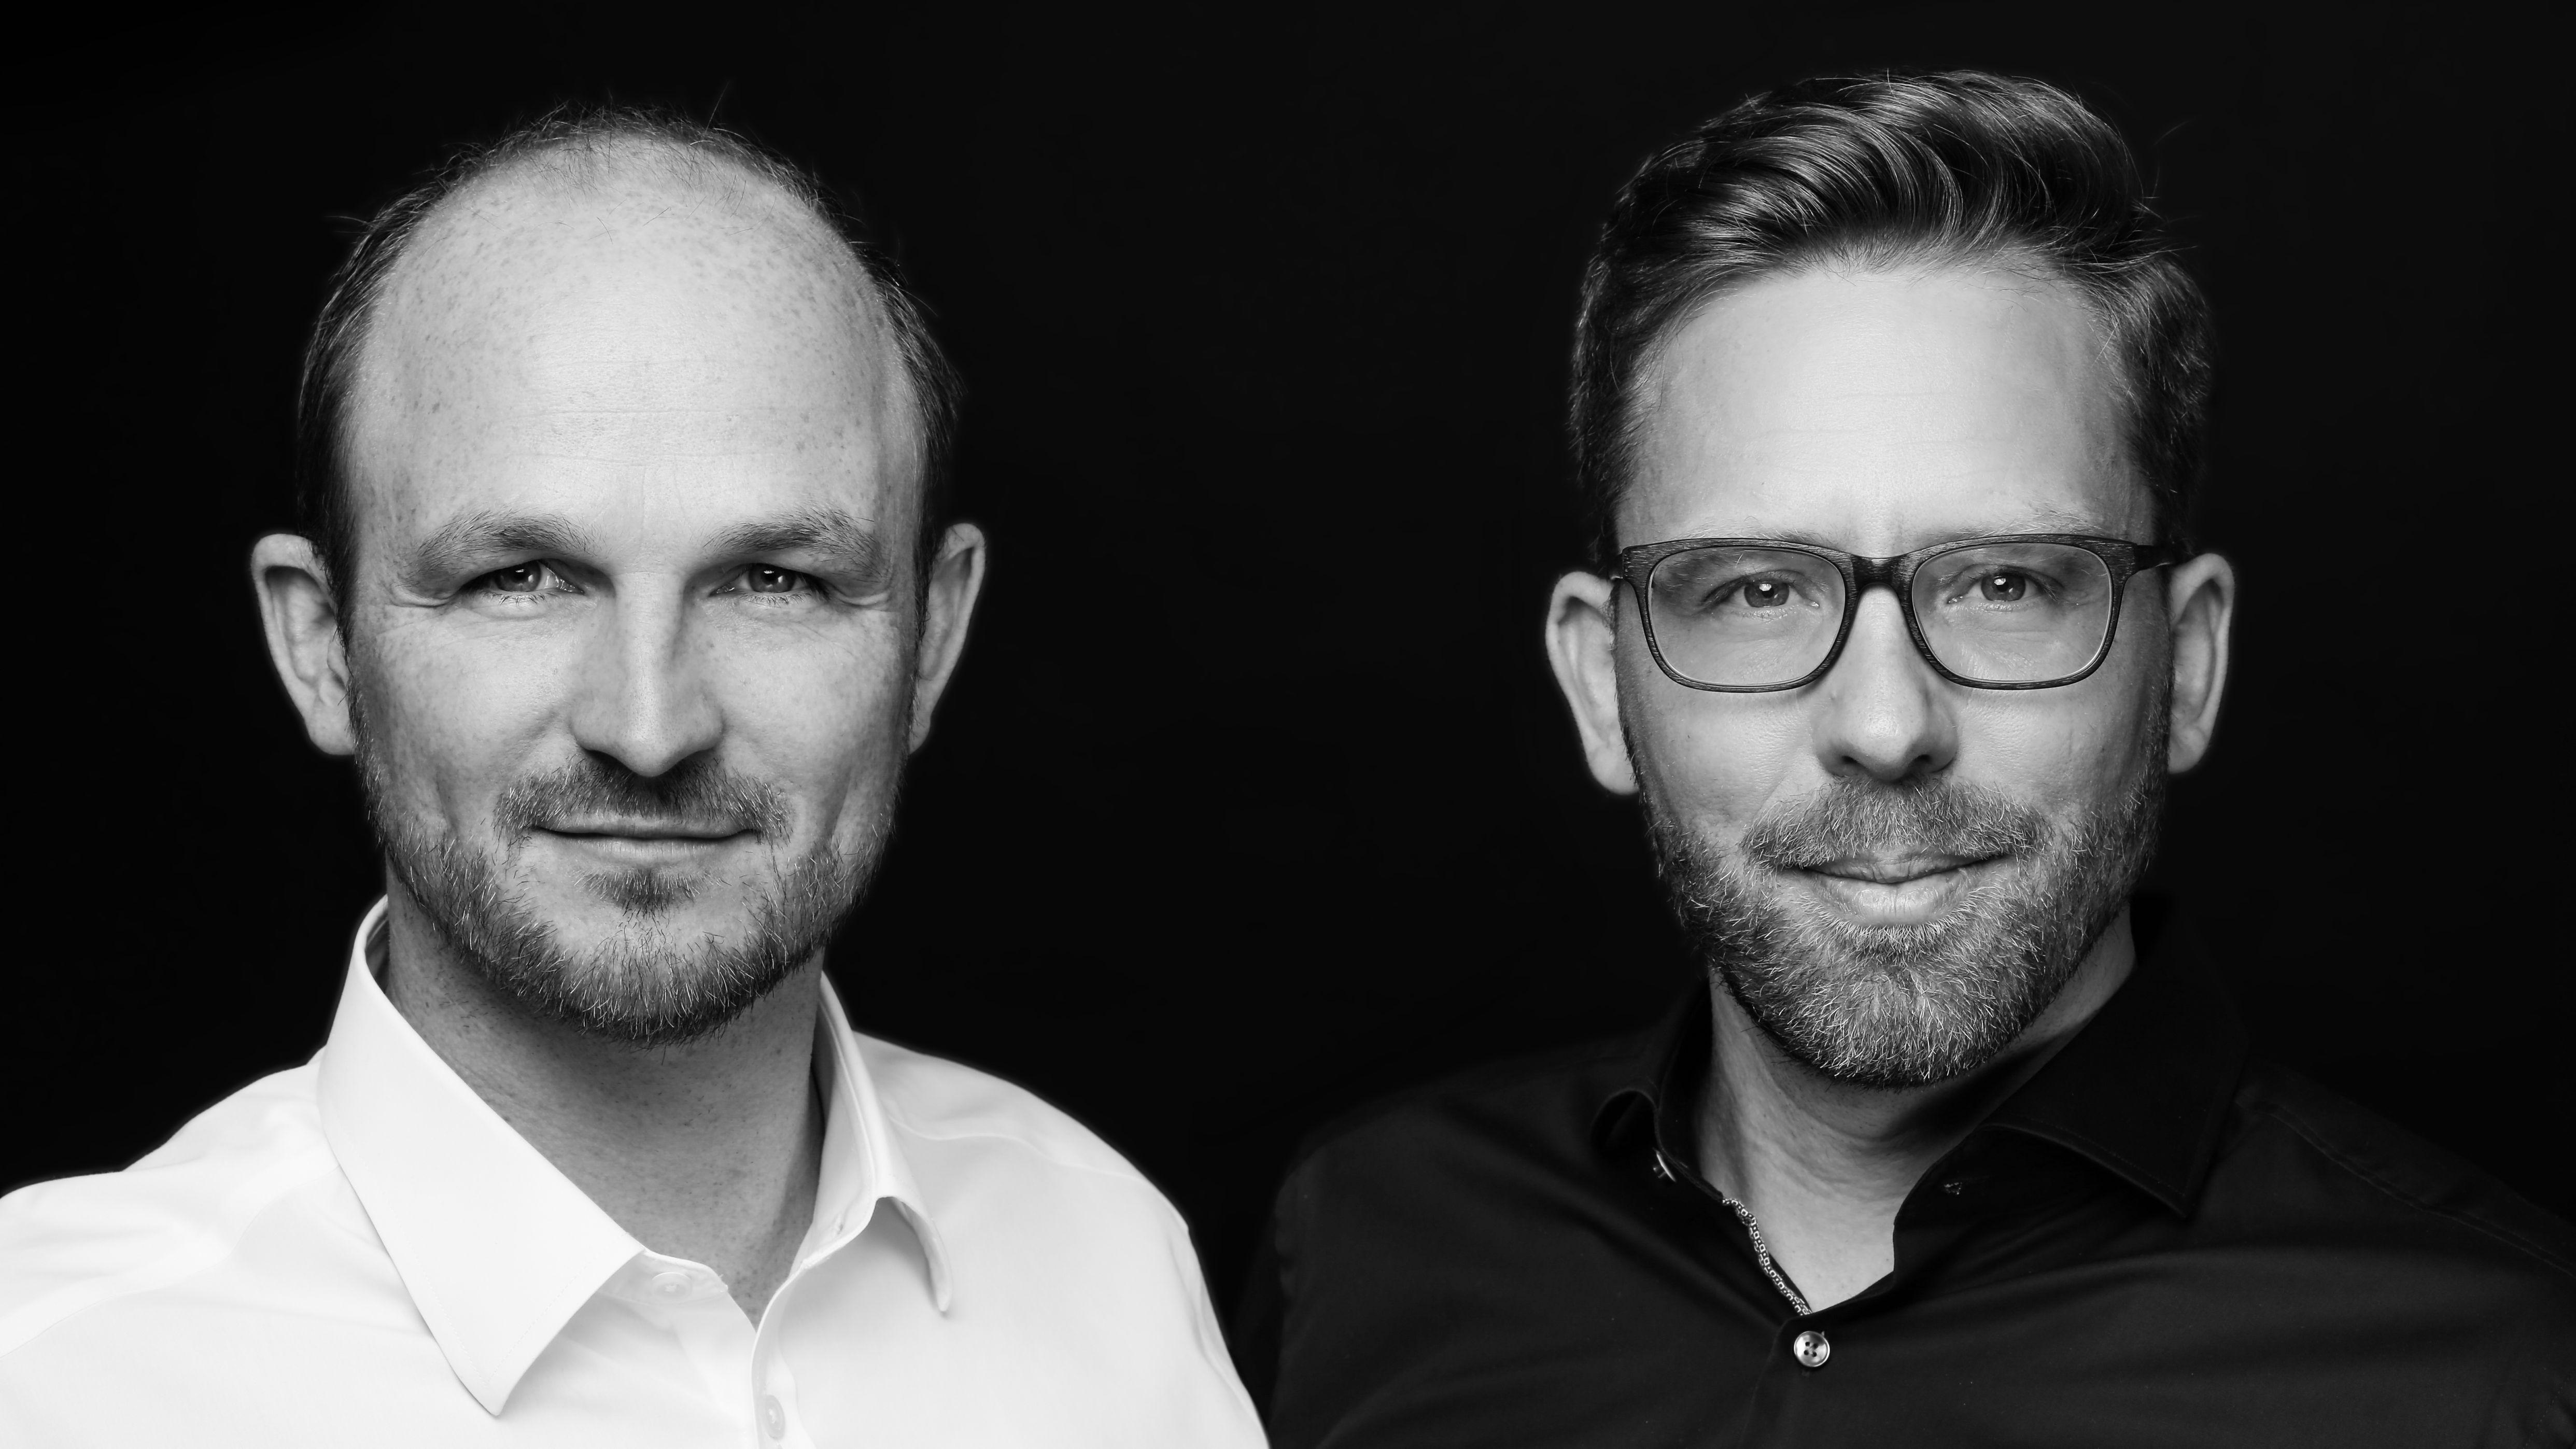 Startups in der Marktforschung: Kampf dem Streuverlust